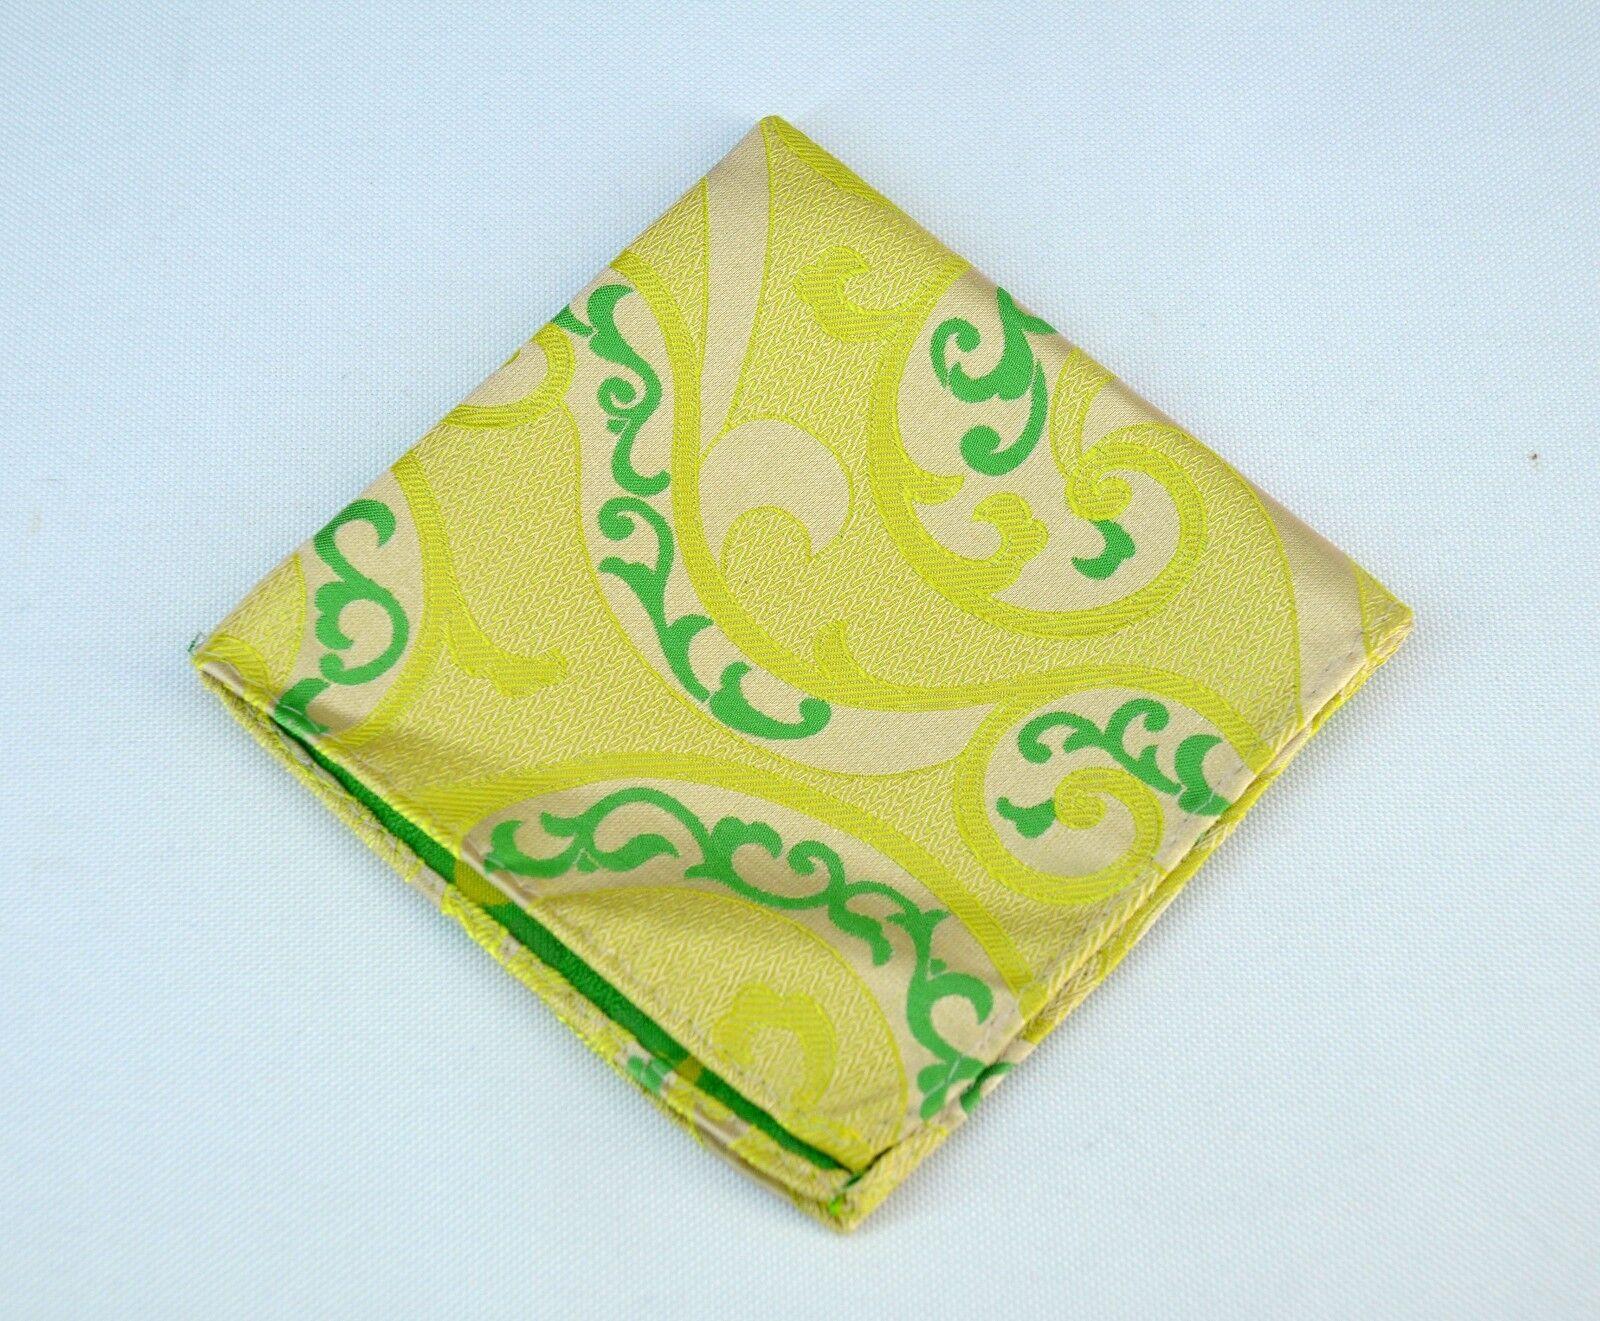 Lord R Colton Masterworks Pocket Square Villarrica Yellow Silk - Retail New